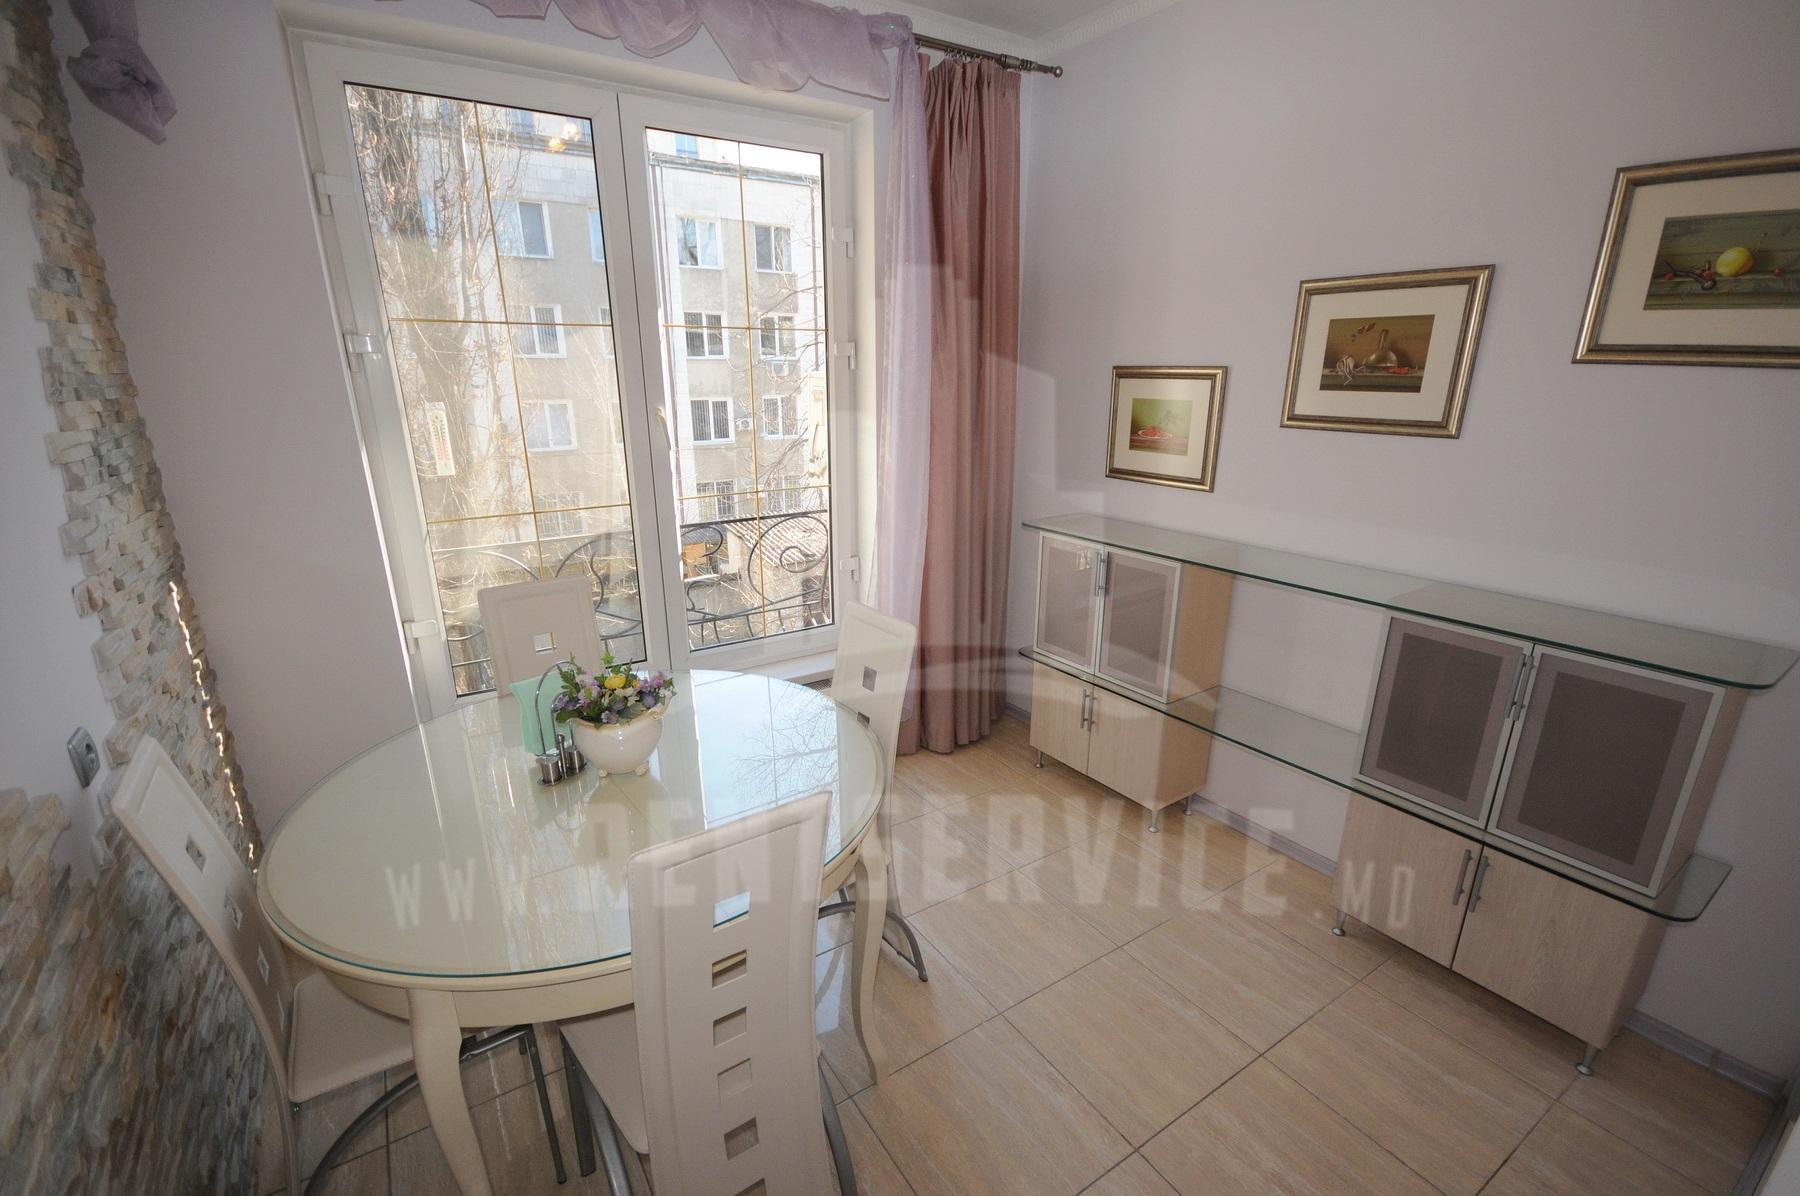 210_apartment_9.JPG